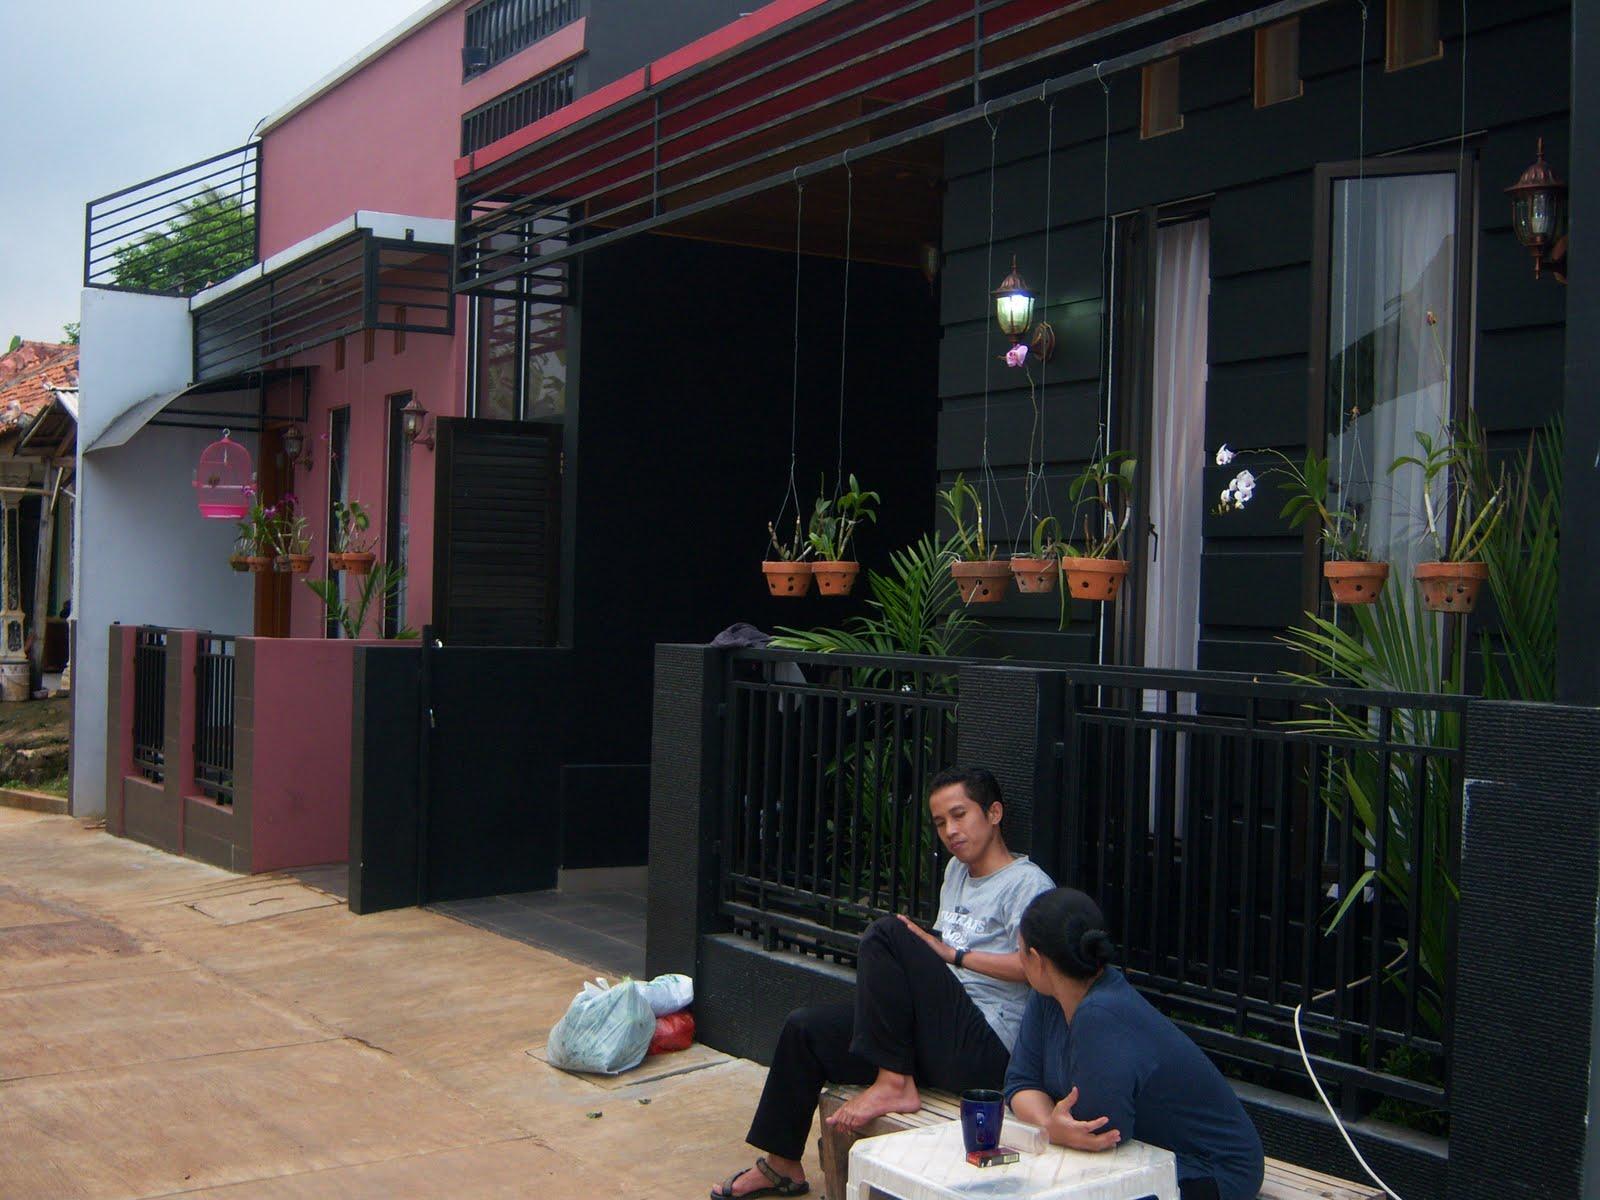 Galeri inspirasi Model Atap Rumah Minimalis Terkini 2015 yg elegan